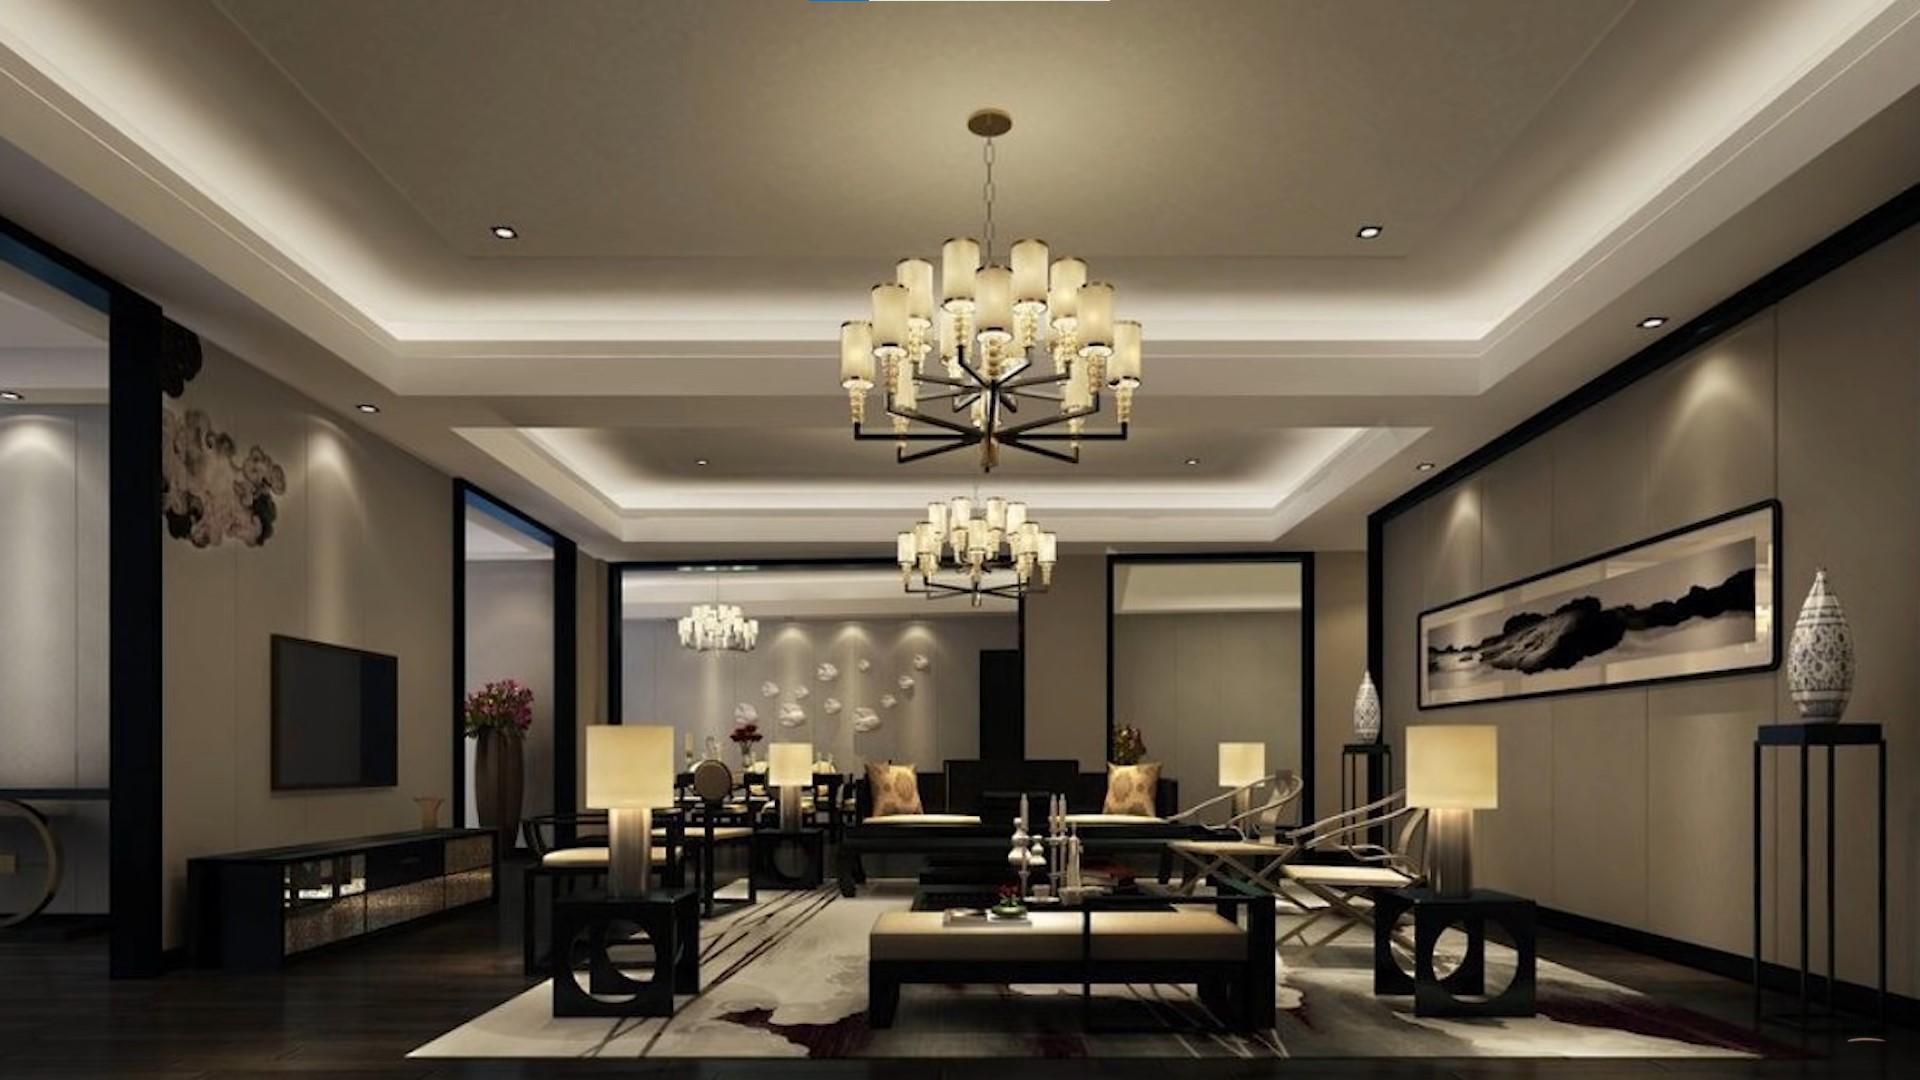 Interior Design- Lighting